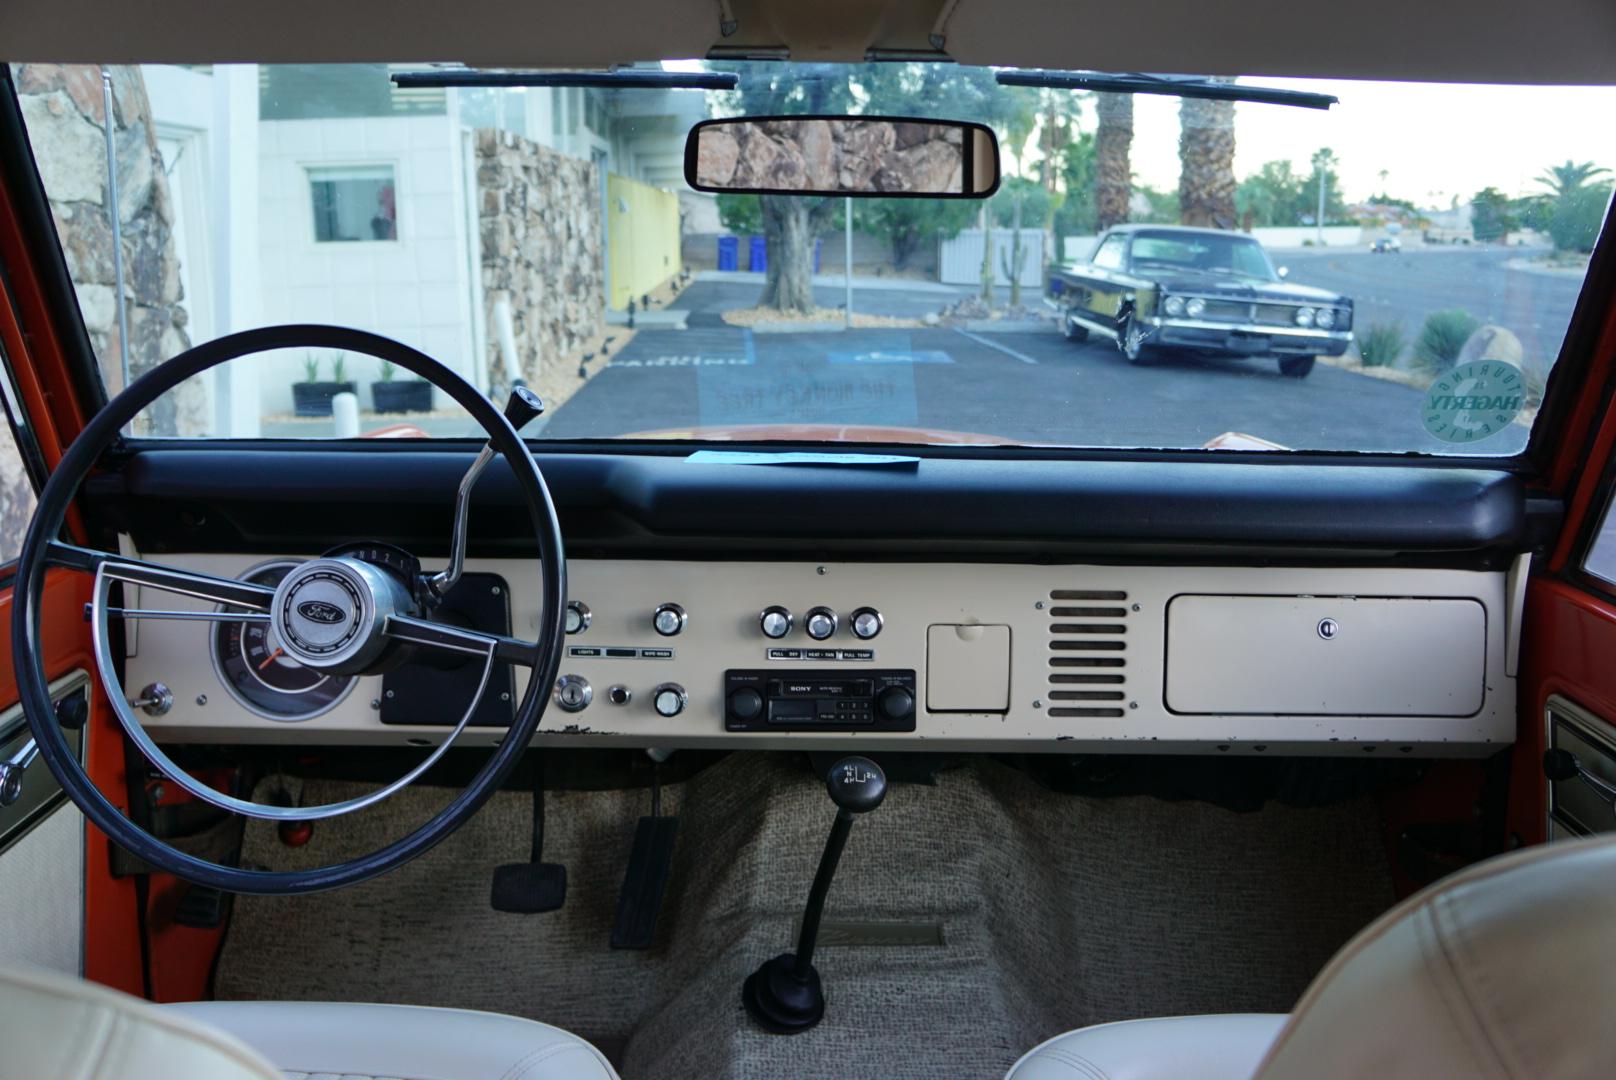 1974 Ford Bronco interior dash